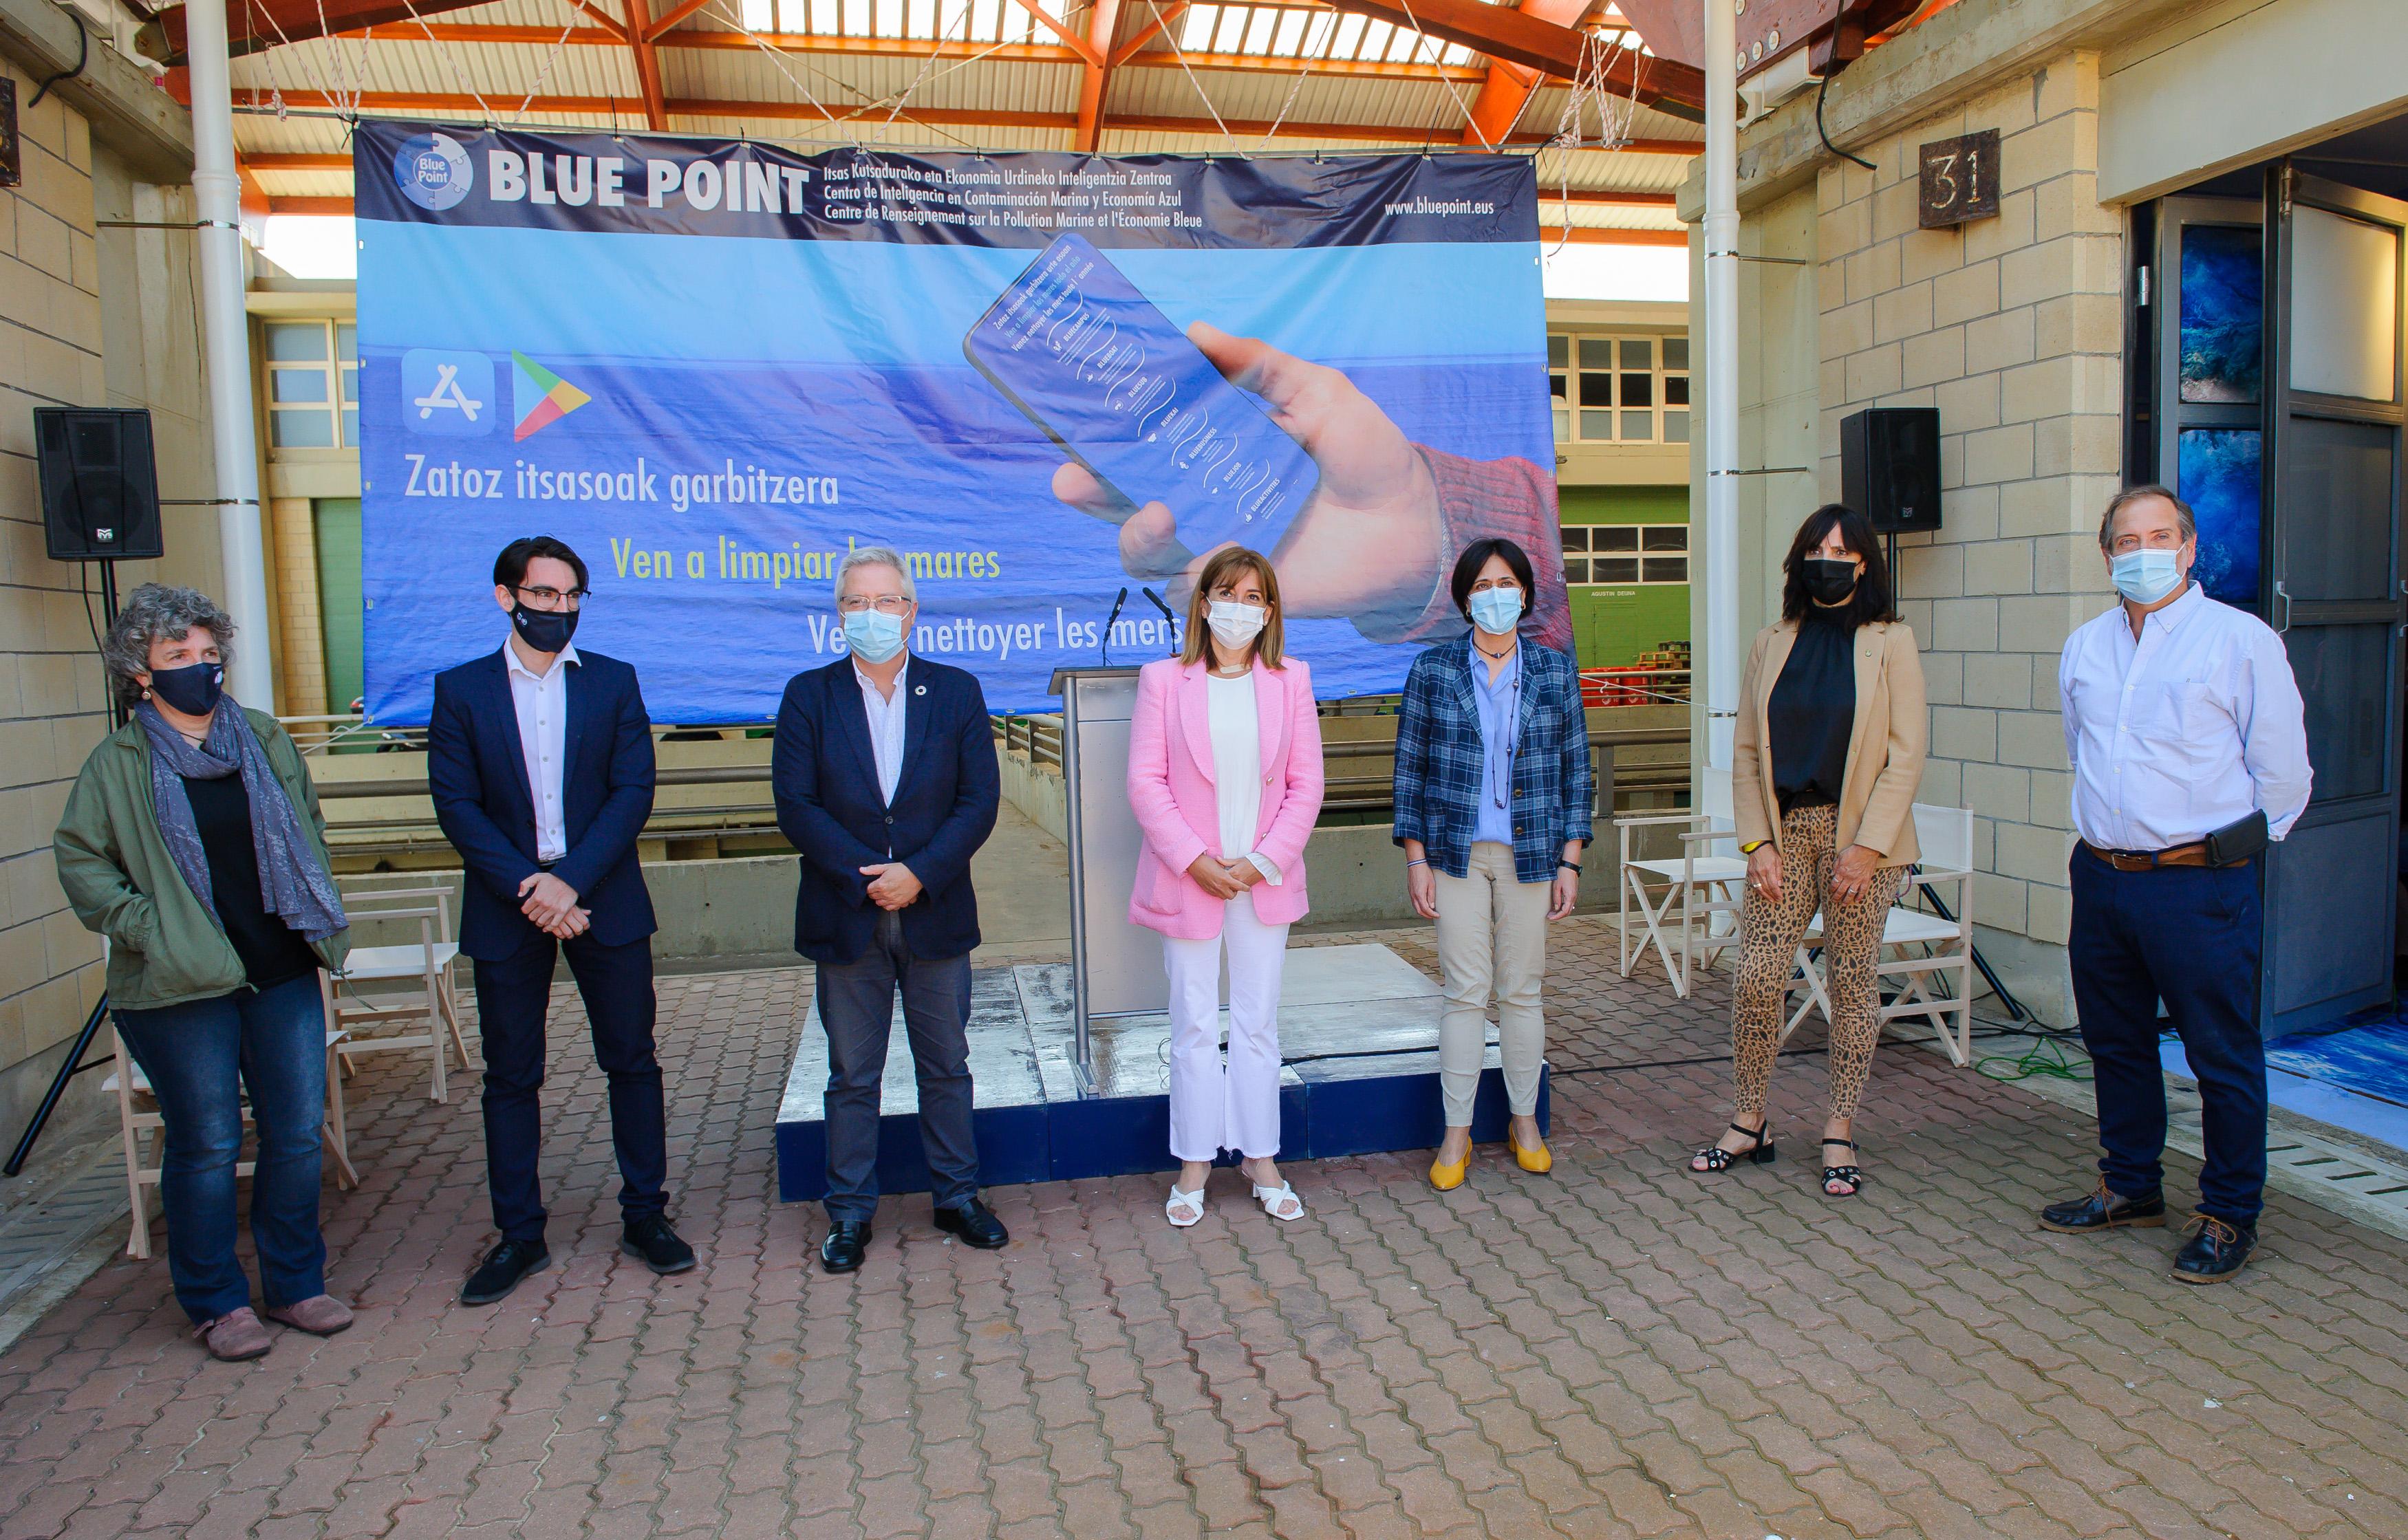 20210607-BARREDO-BLUE_POINT-107.jpg